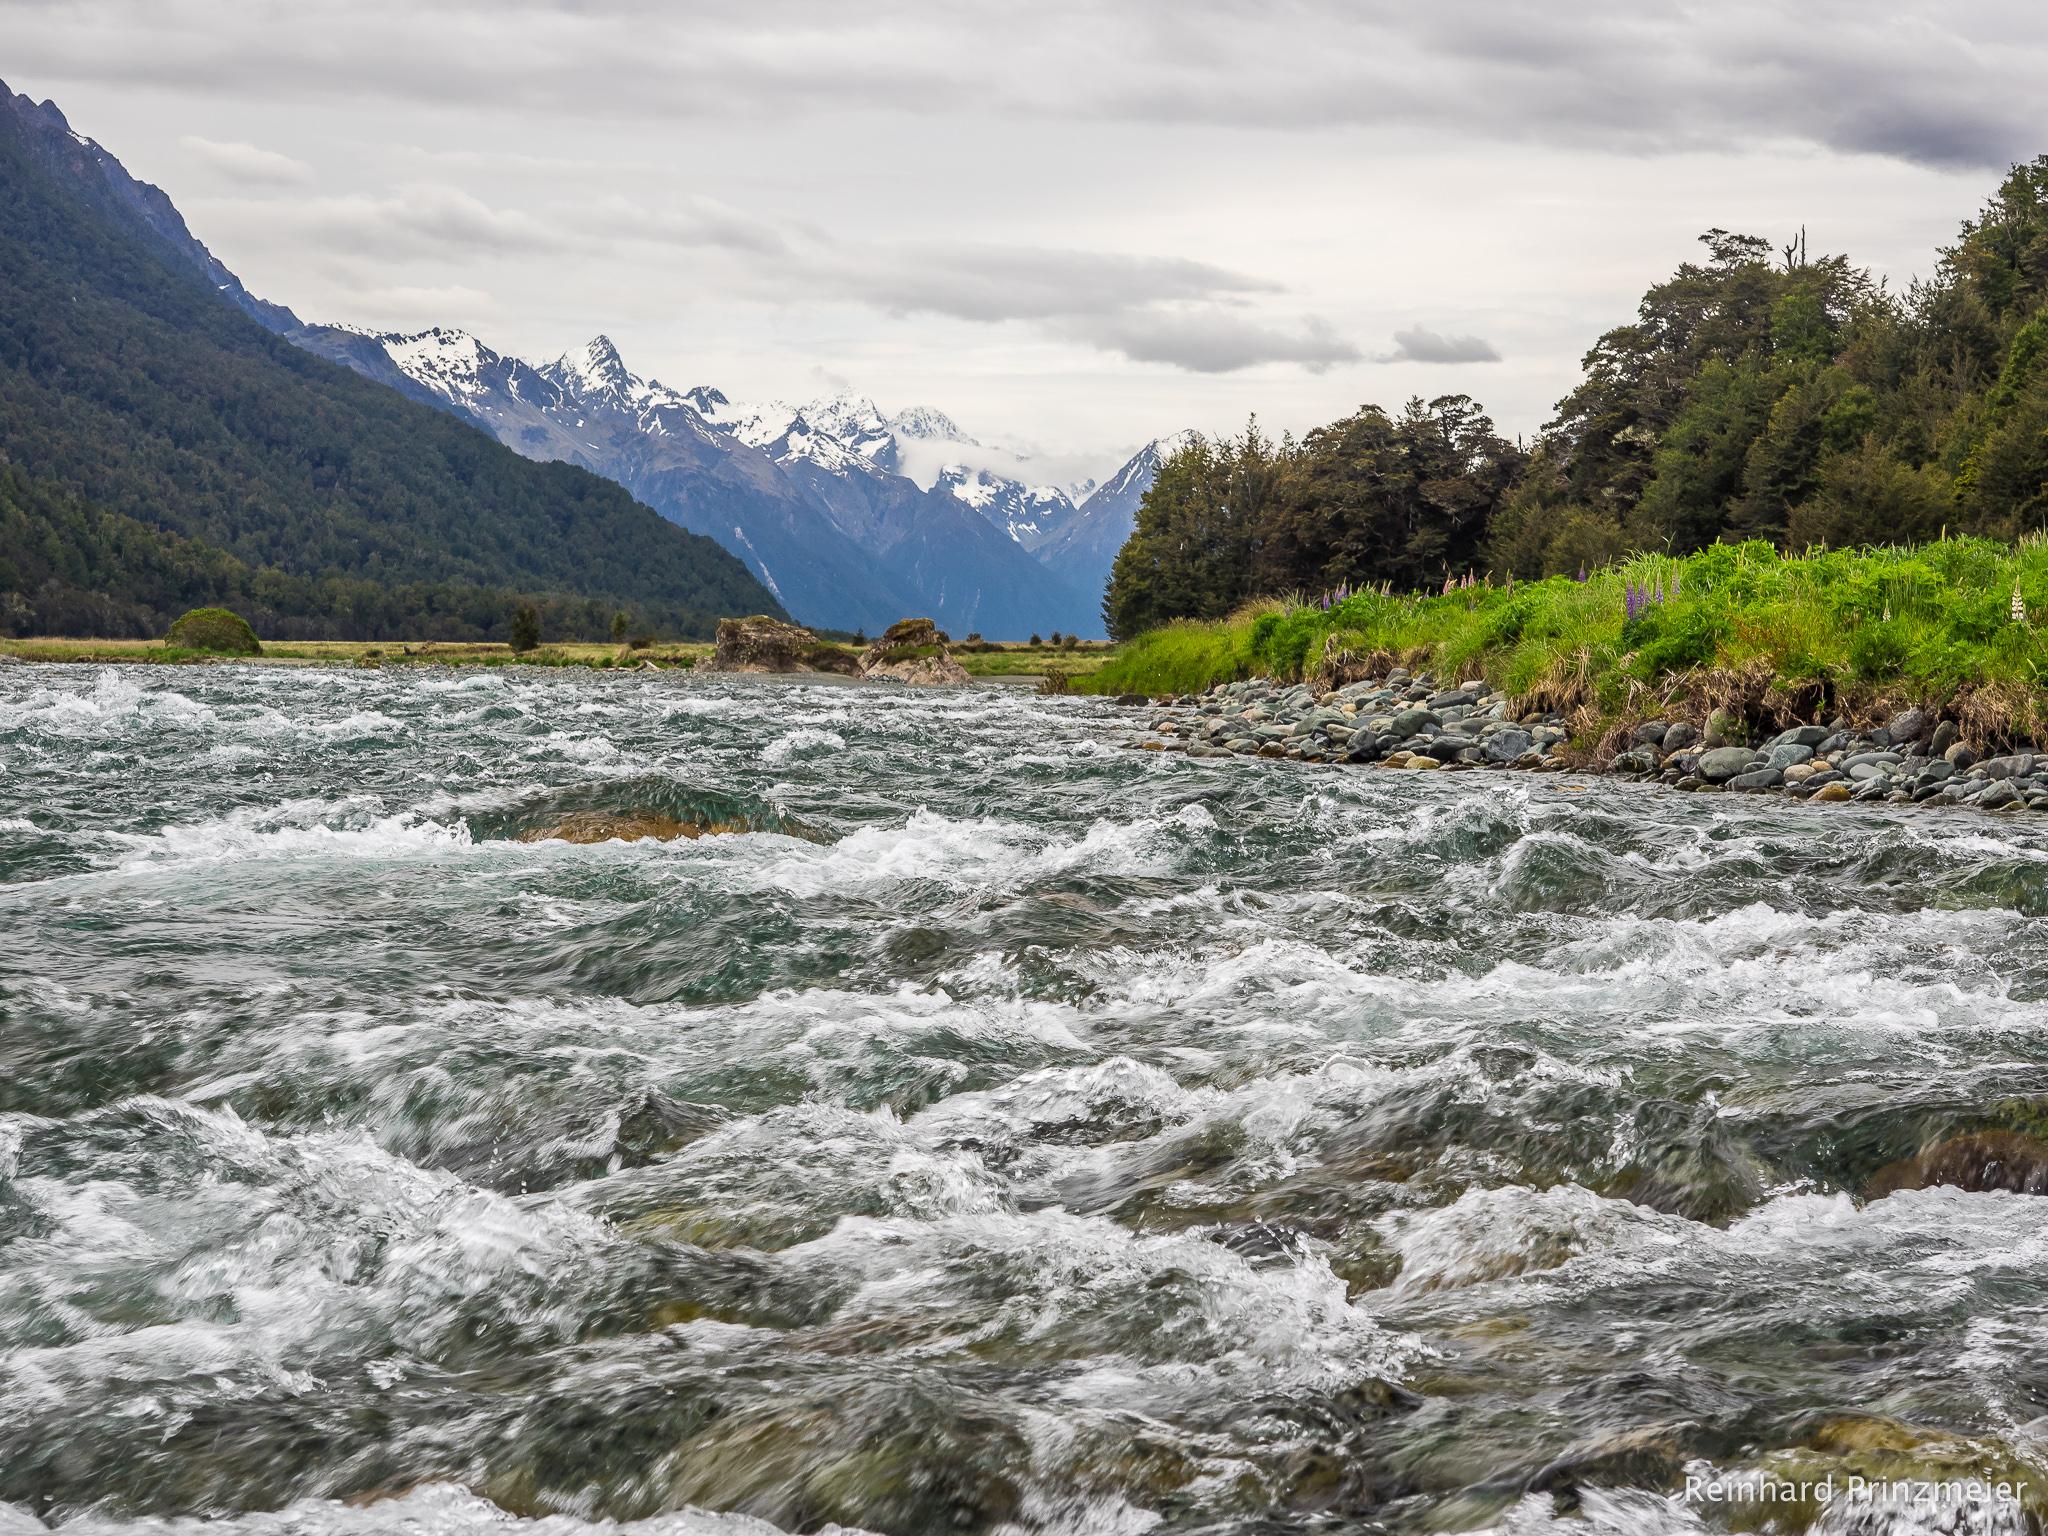 Eglinton River, New Zealand